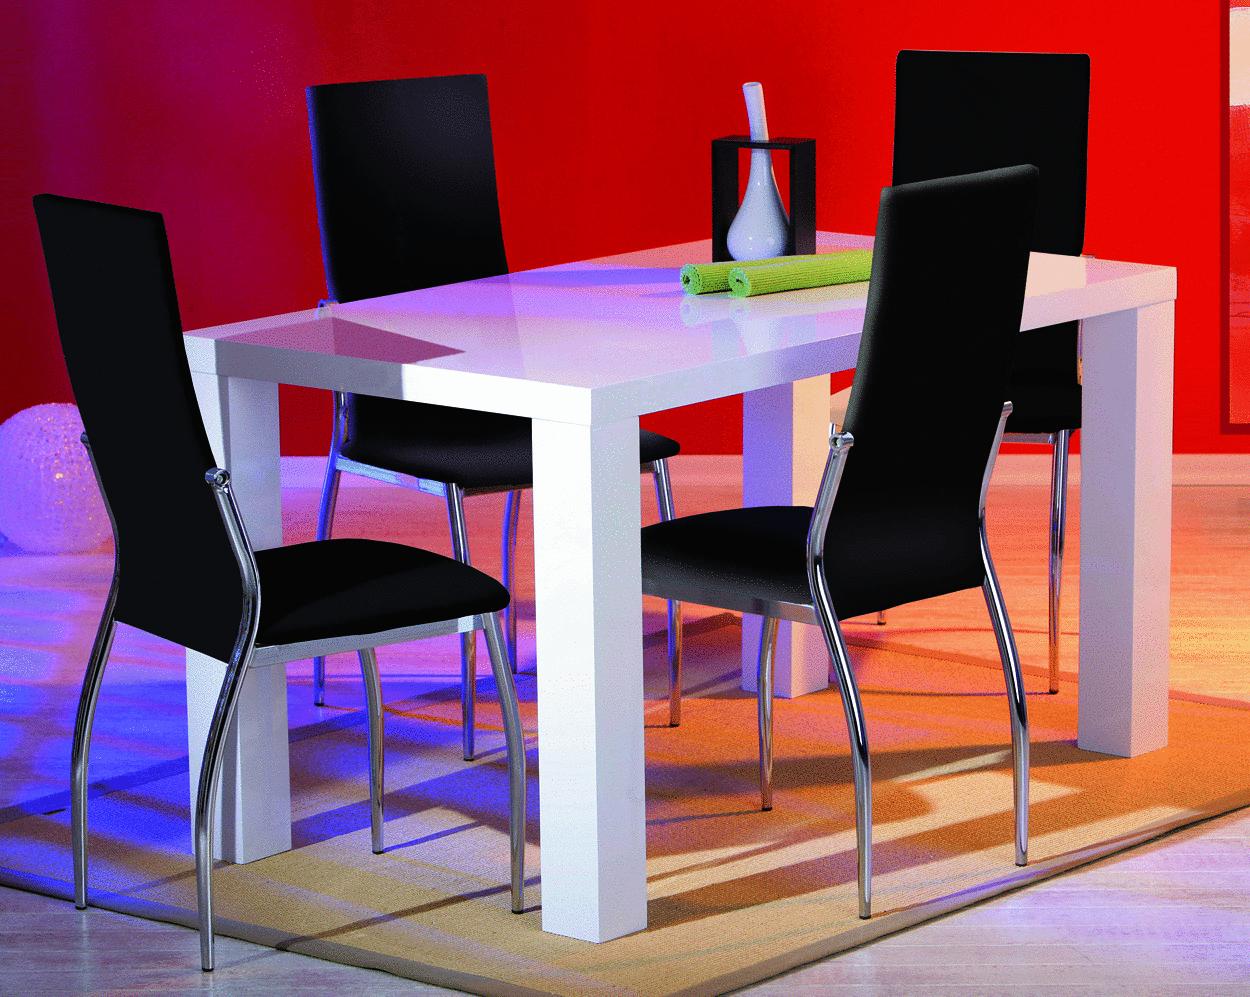 Sedia moderna bianca o nera mobile ufficio cucina sala for Sedie moderne design